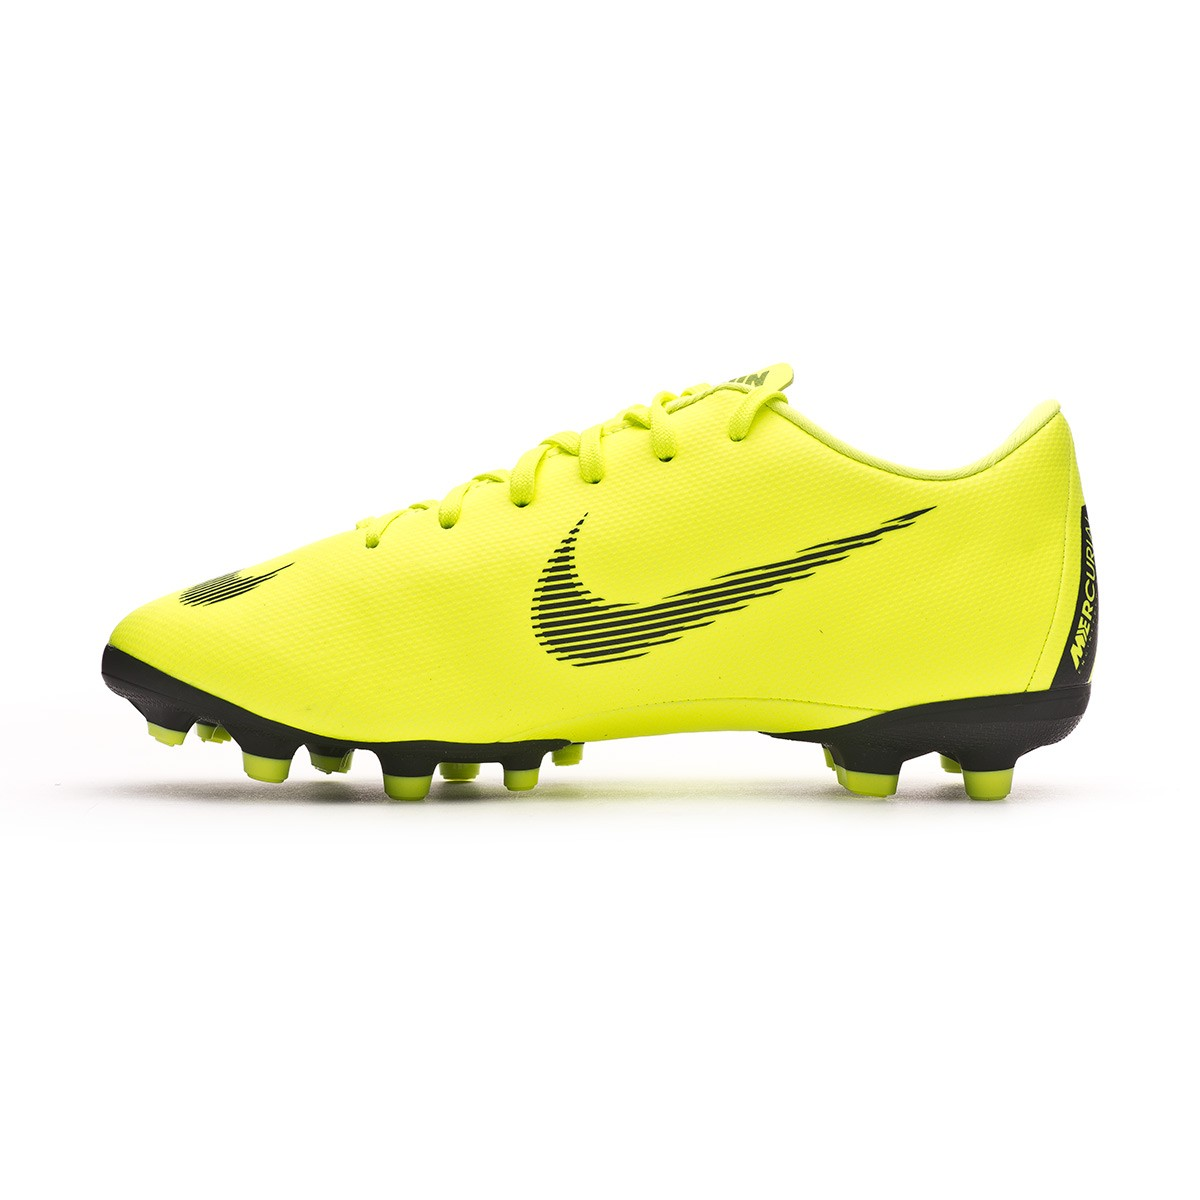 29f4d3bf5 Football Boots Nike Kids Mercurial Vapor XII Academy MG Volt-Black -  Football store Fútbol Emotion